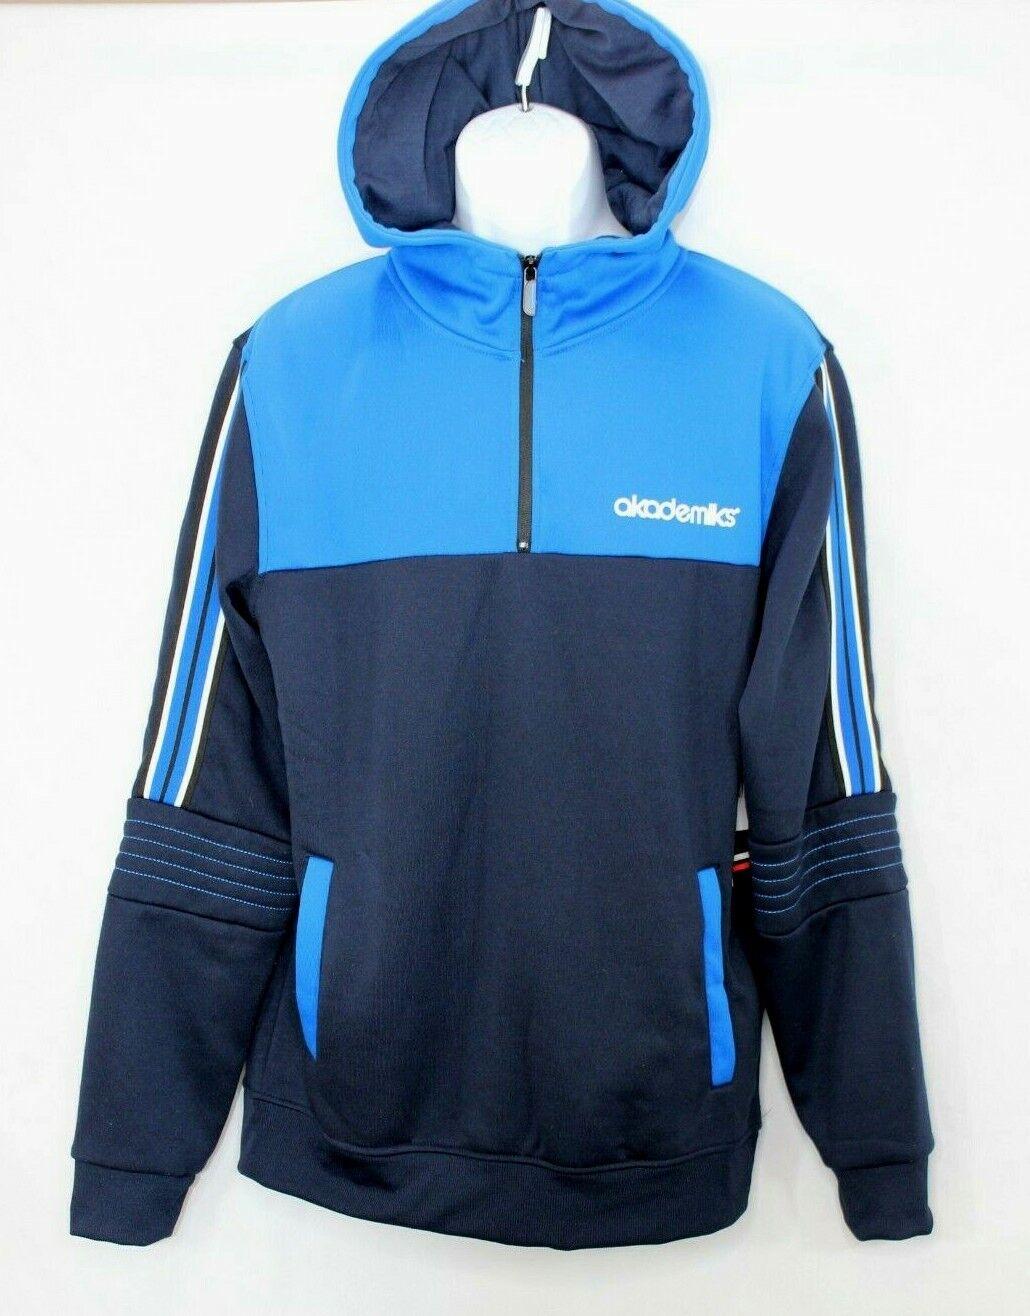 AKADEMIKS Hoodie Fleece 1/4 Zip Navy Blue Men's Size Large NWT